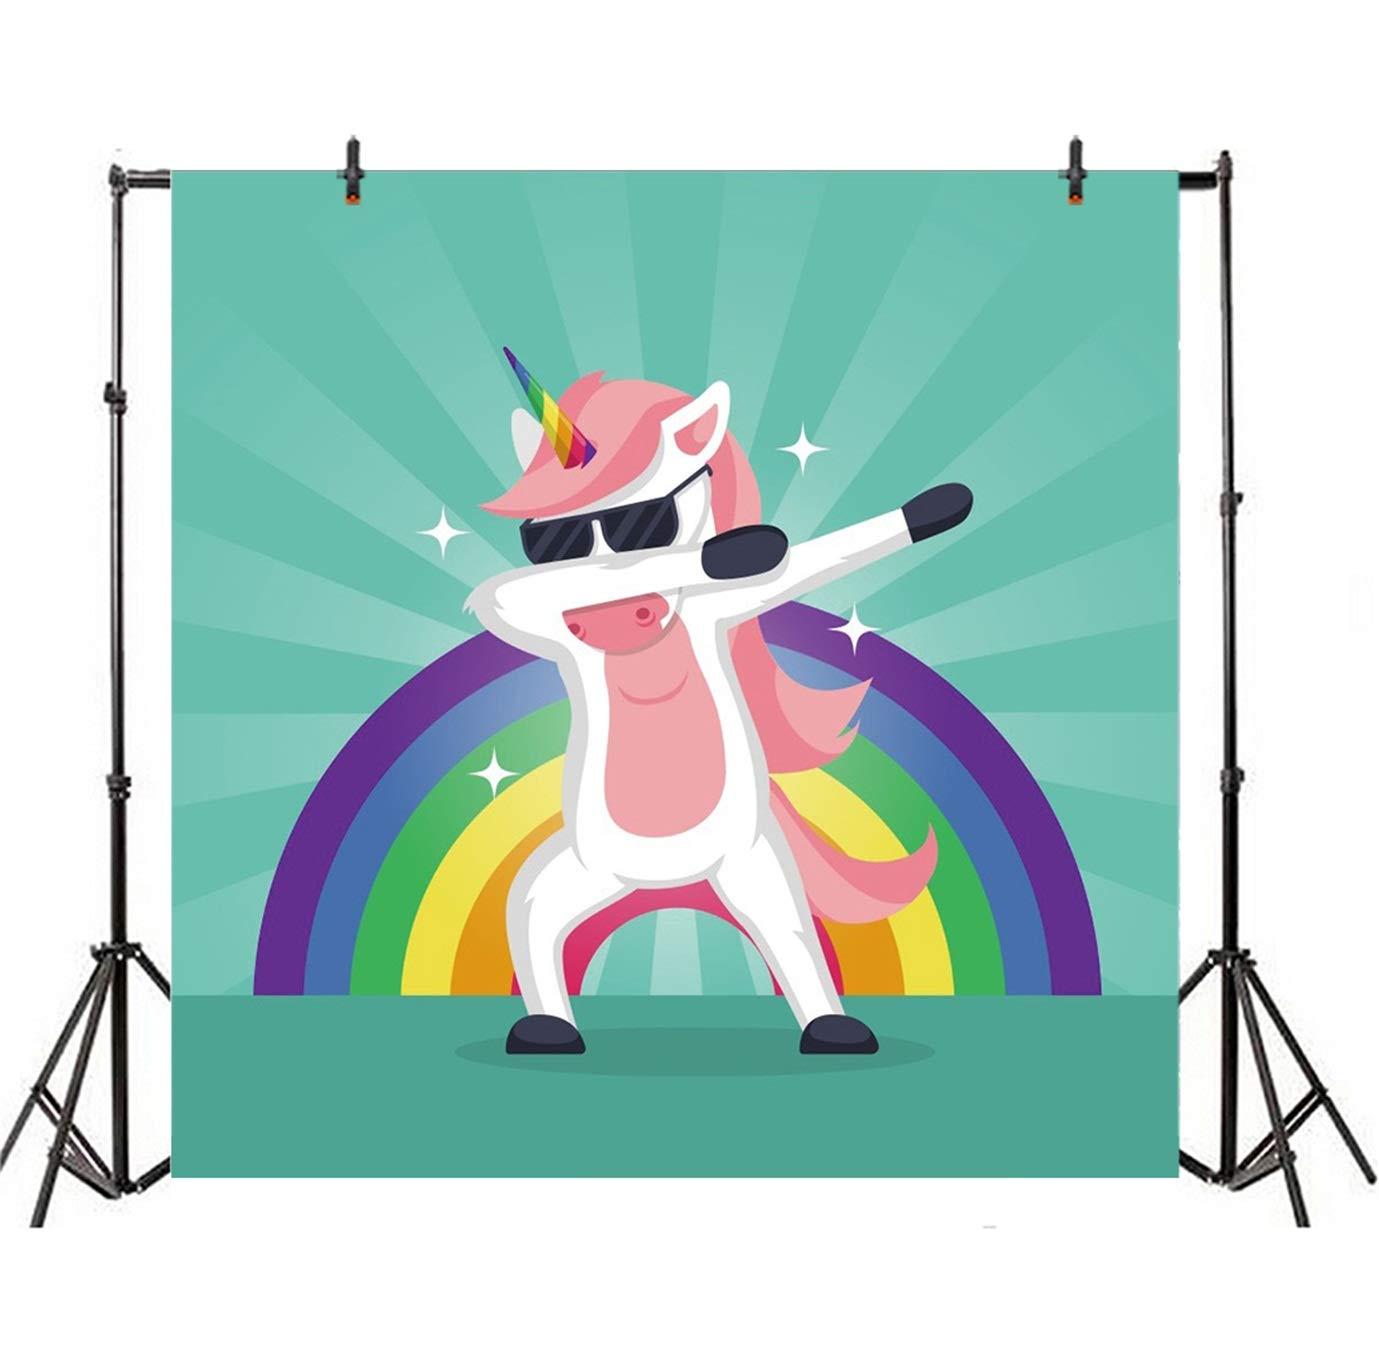 Amazoncom CSFOTO 5x5ft Background for Dabbing Unicorn Cool 1379x1367